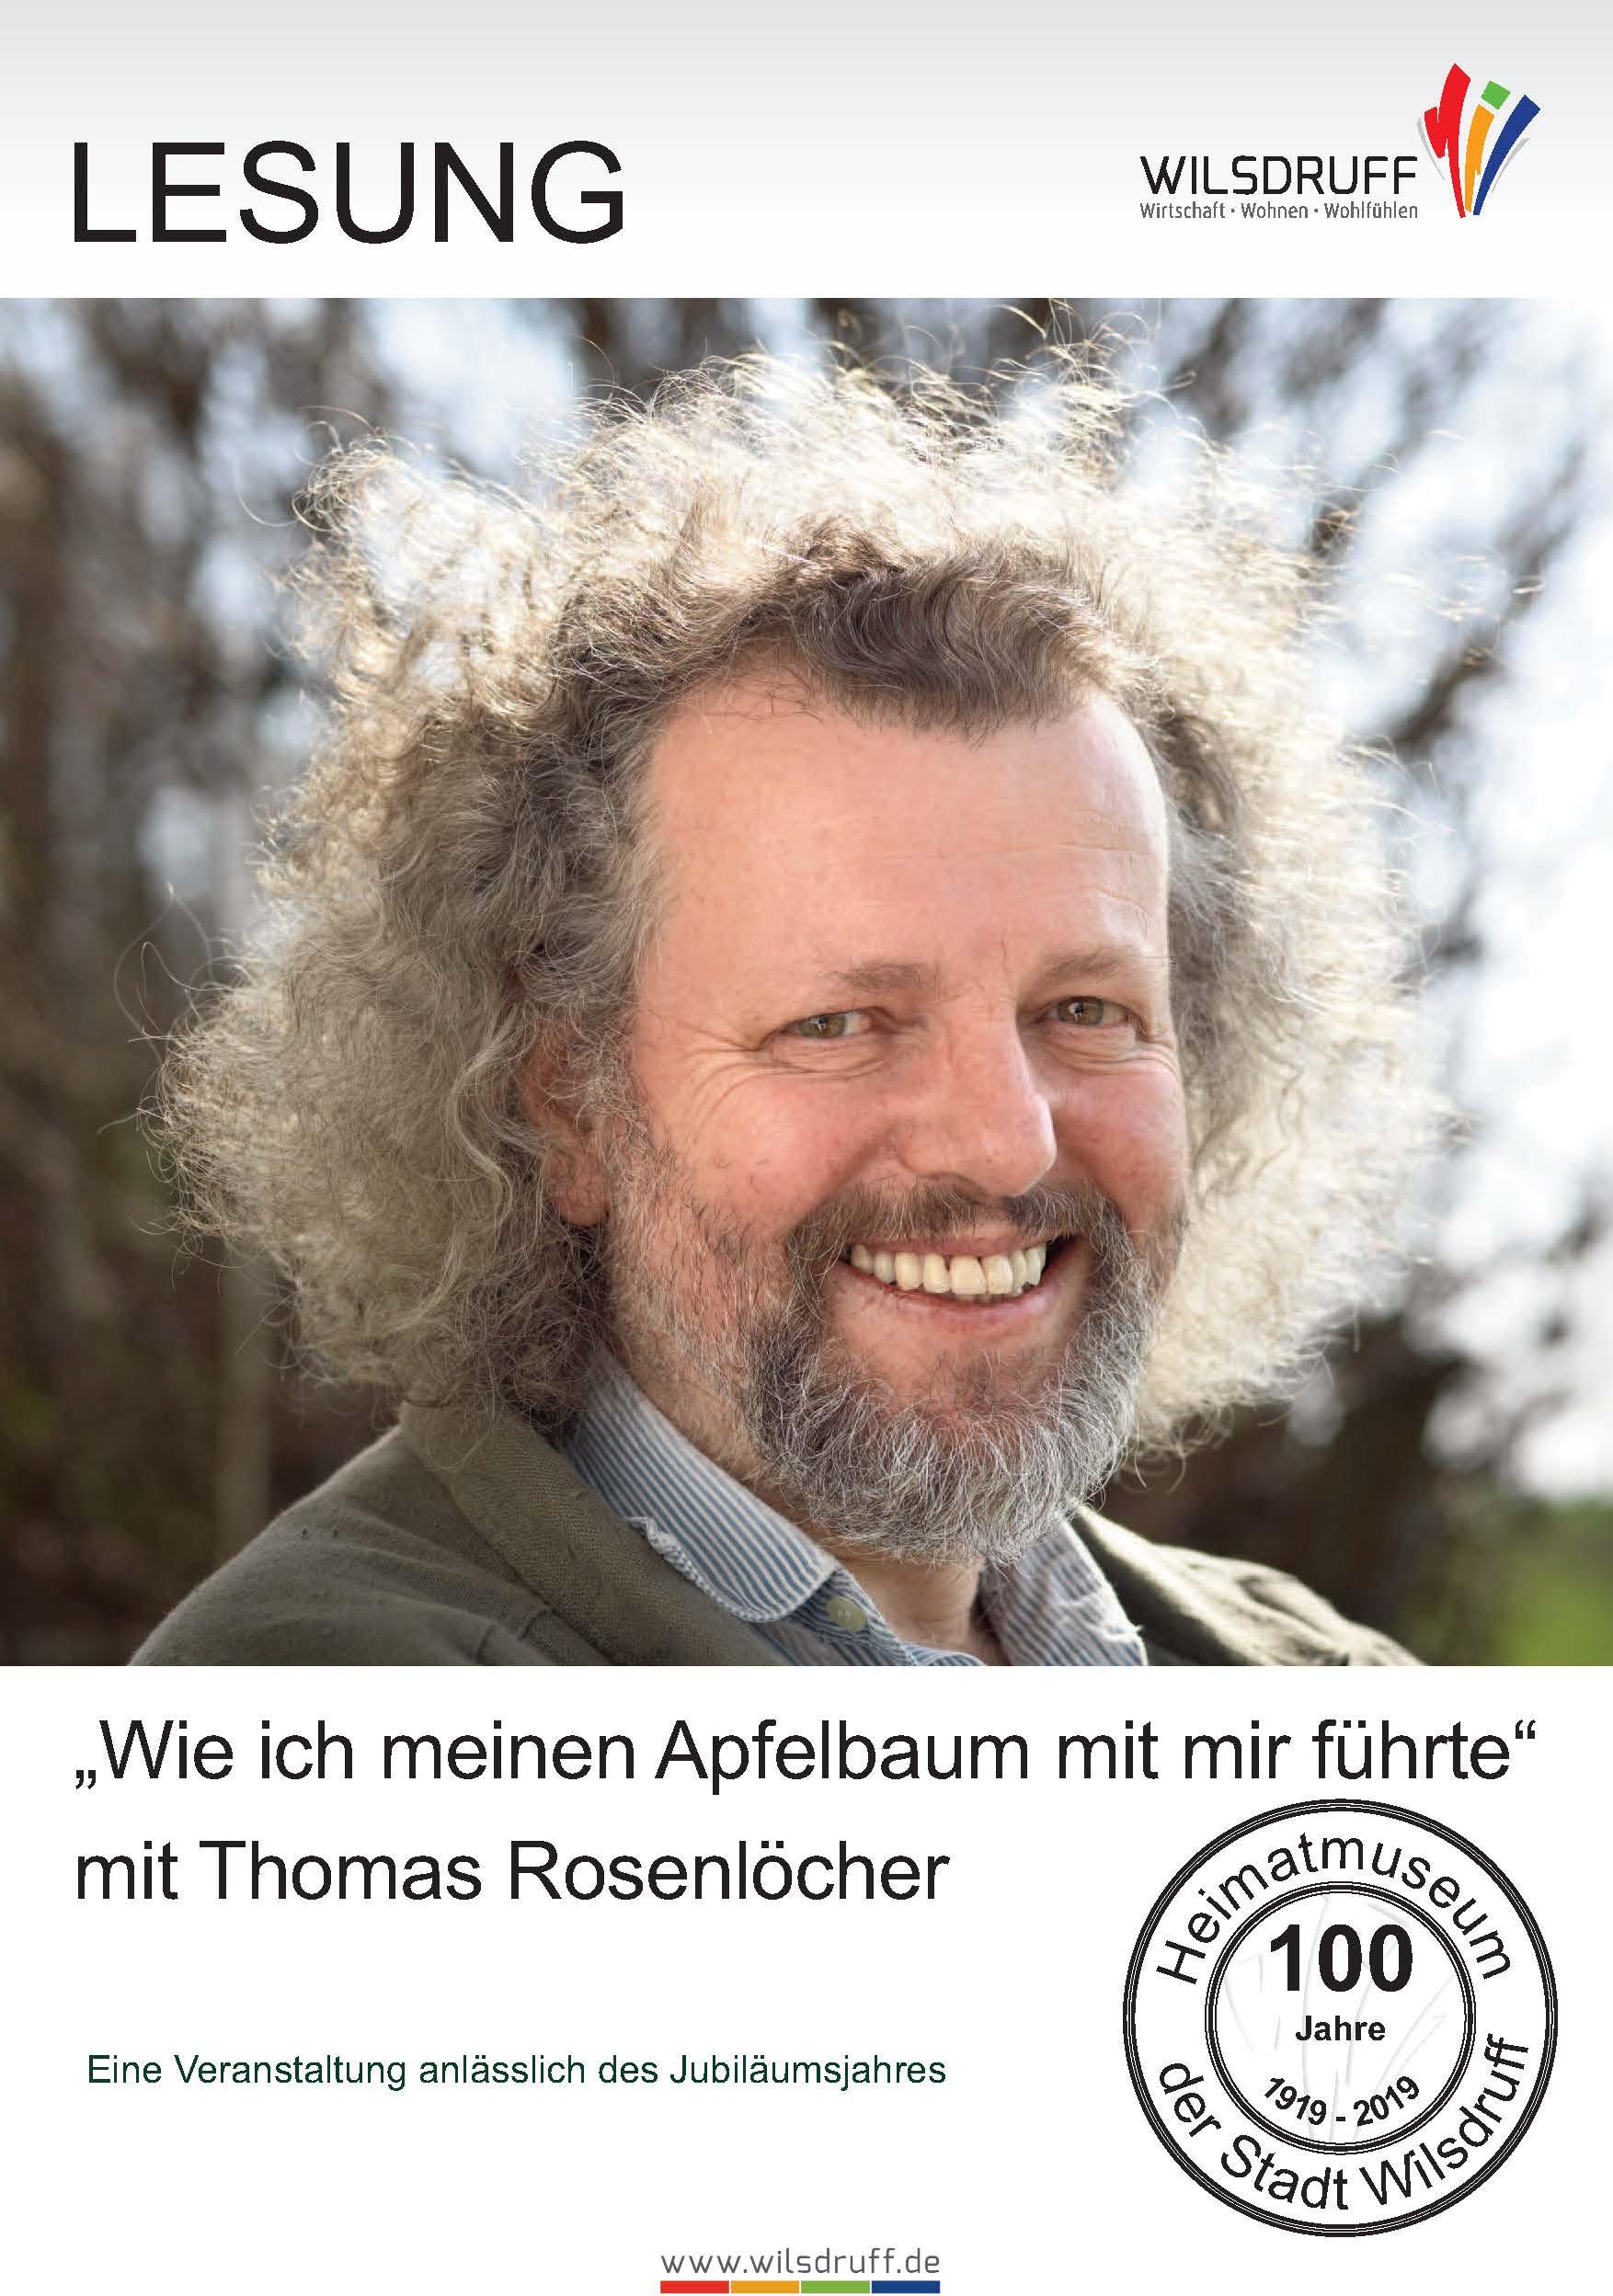 2019-03-25_Heimatmuseum_Lesung_Rosenlöcher.jpg